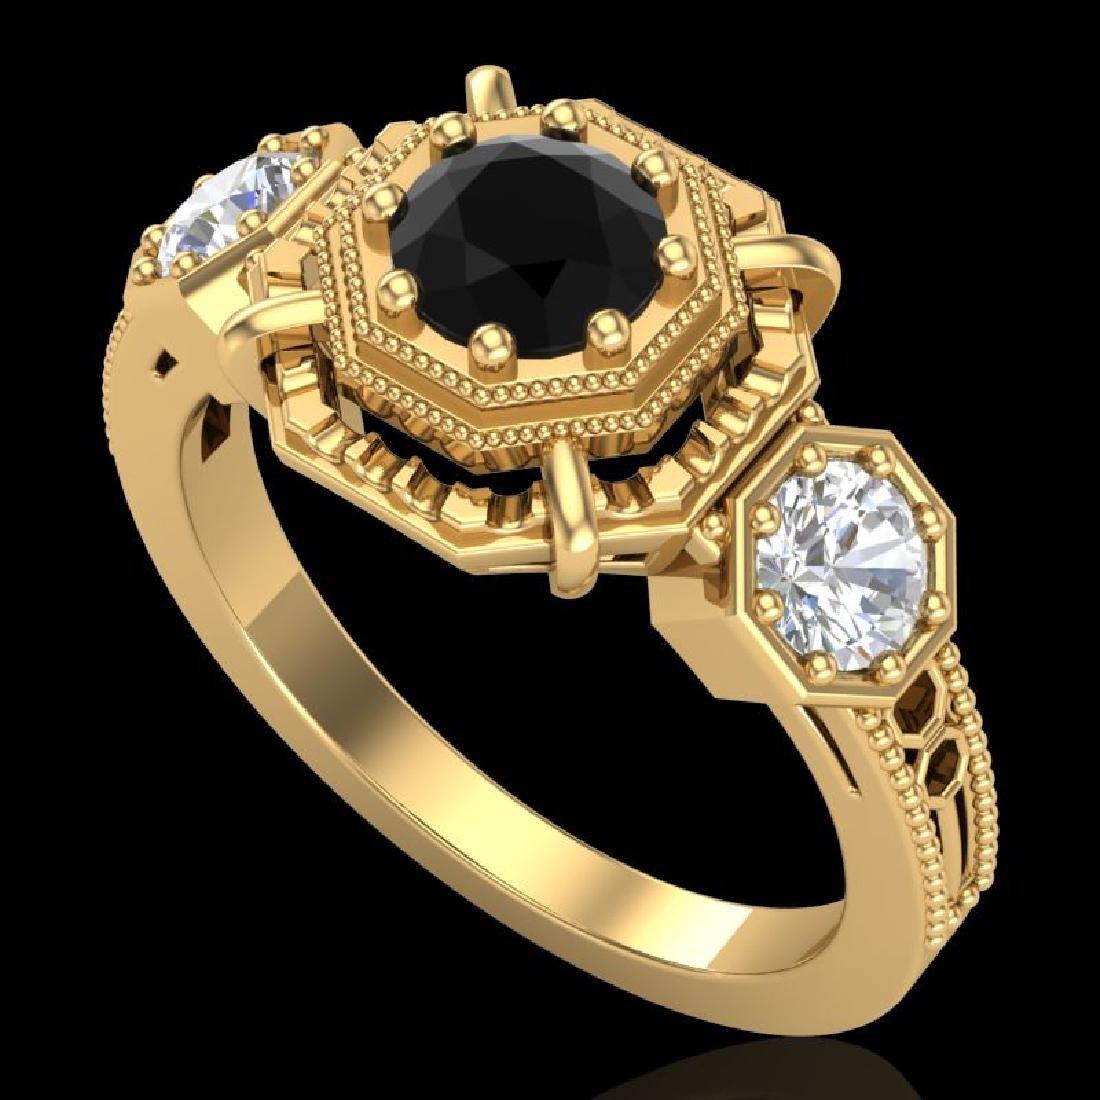 1.01 CTW Fancy Black Diamond Solitaire Art Deco 3 Stone